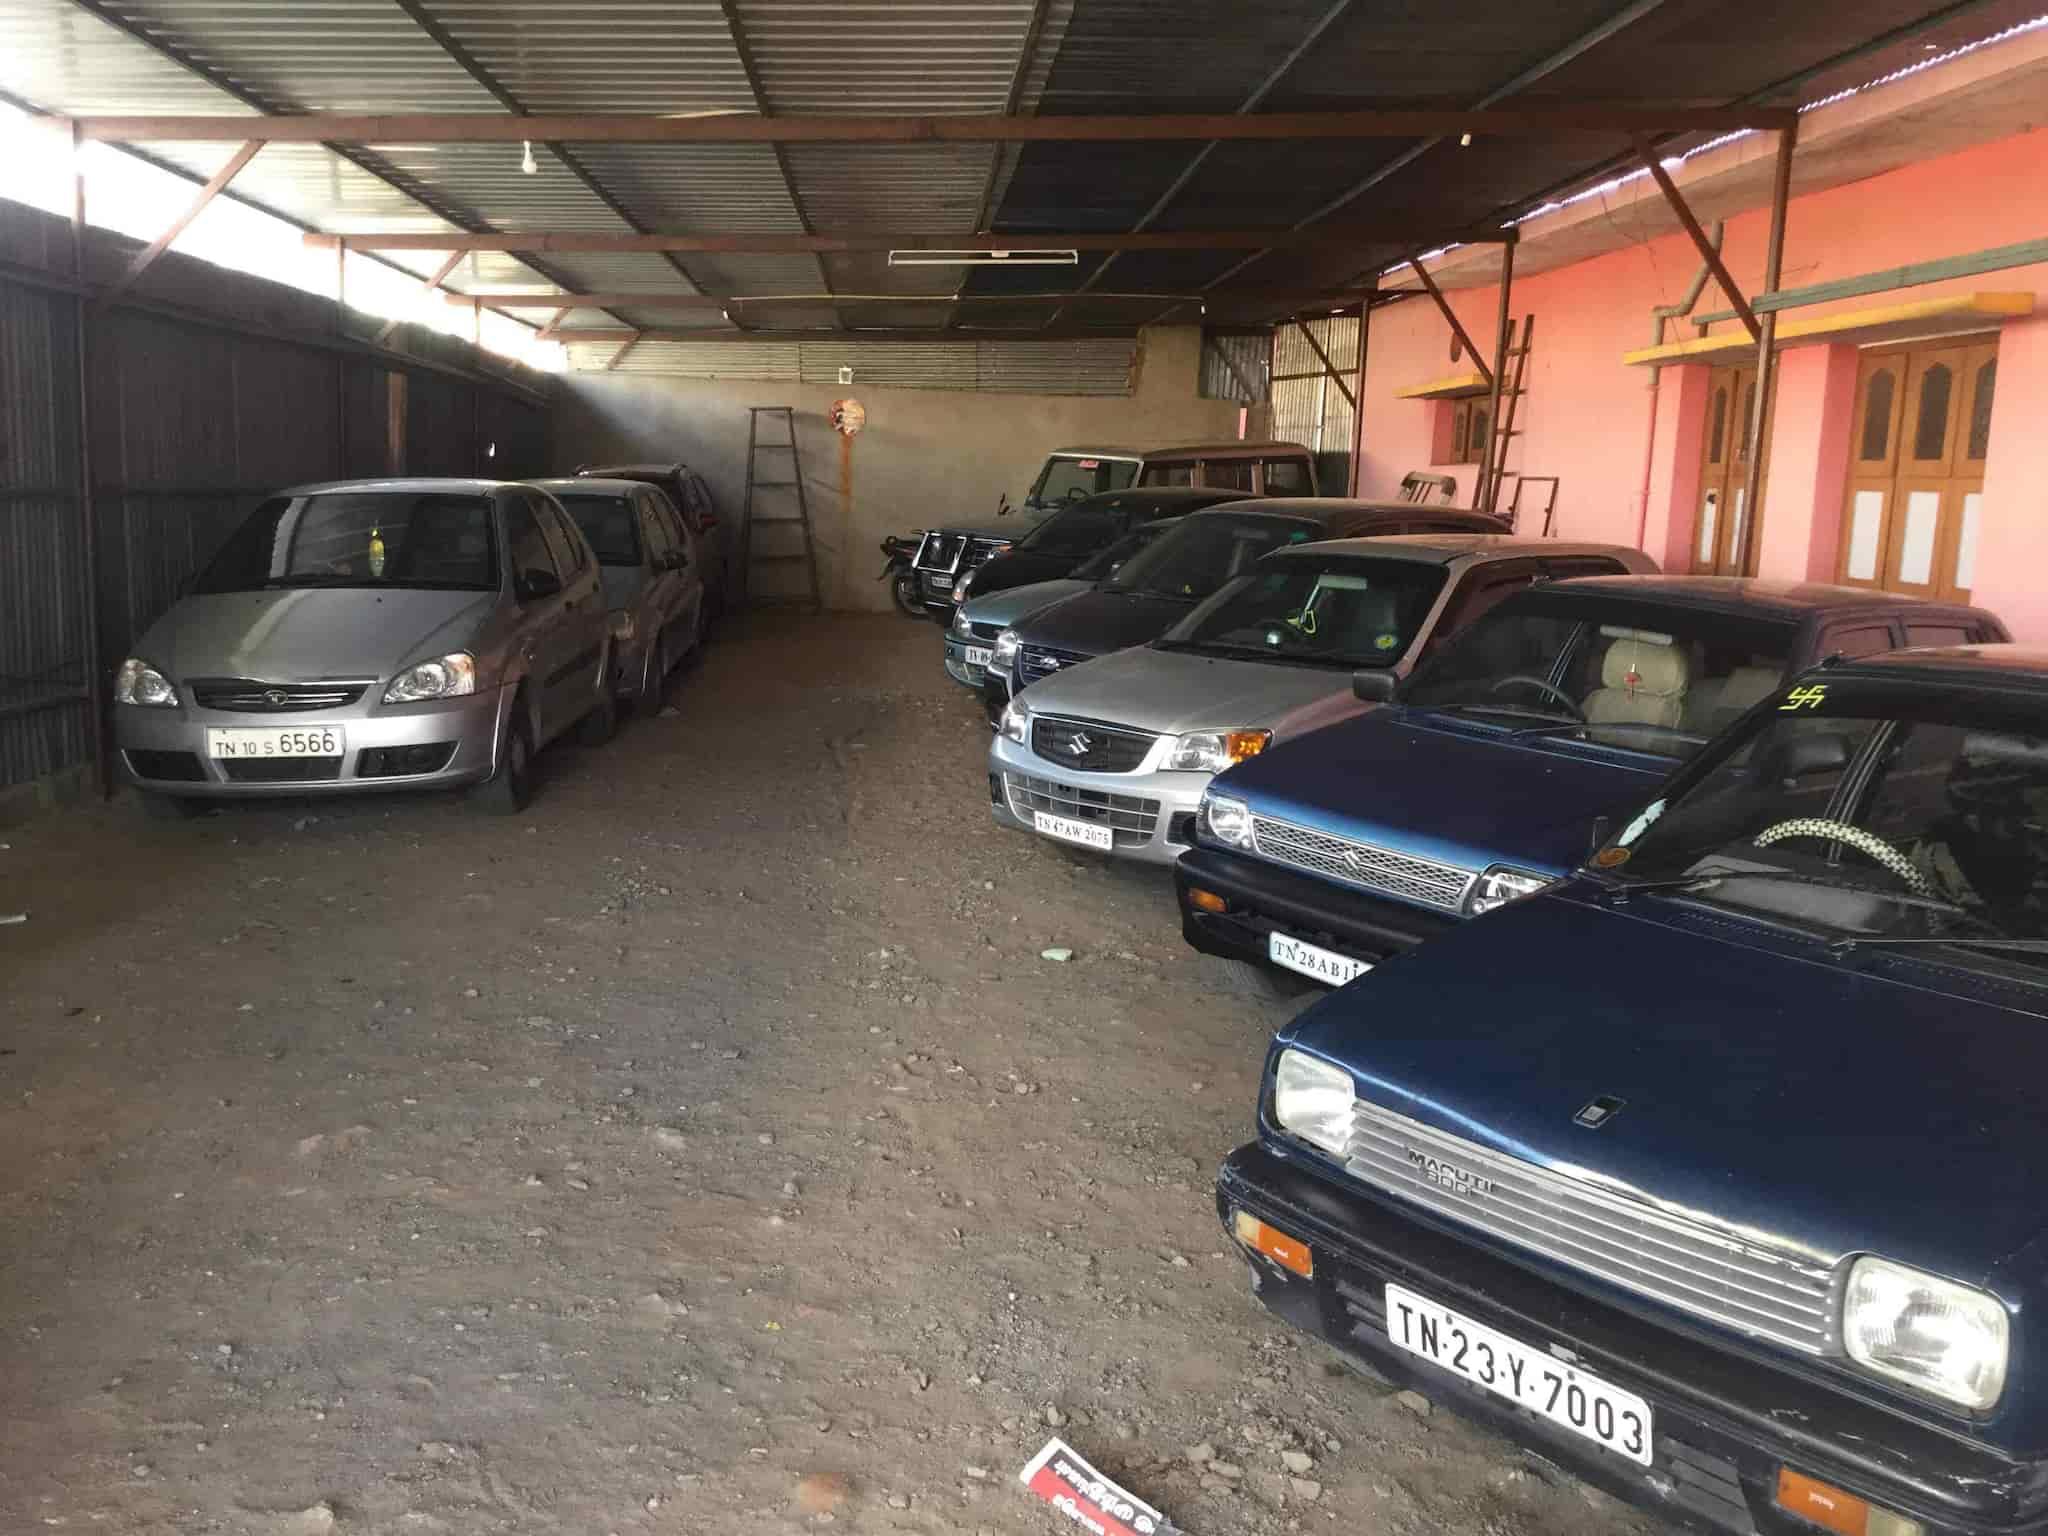 justdial dealers vibrant in gachibowli fortune nissan opp bzdet hyderabad biodiversity car md